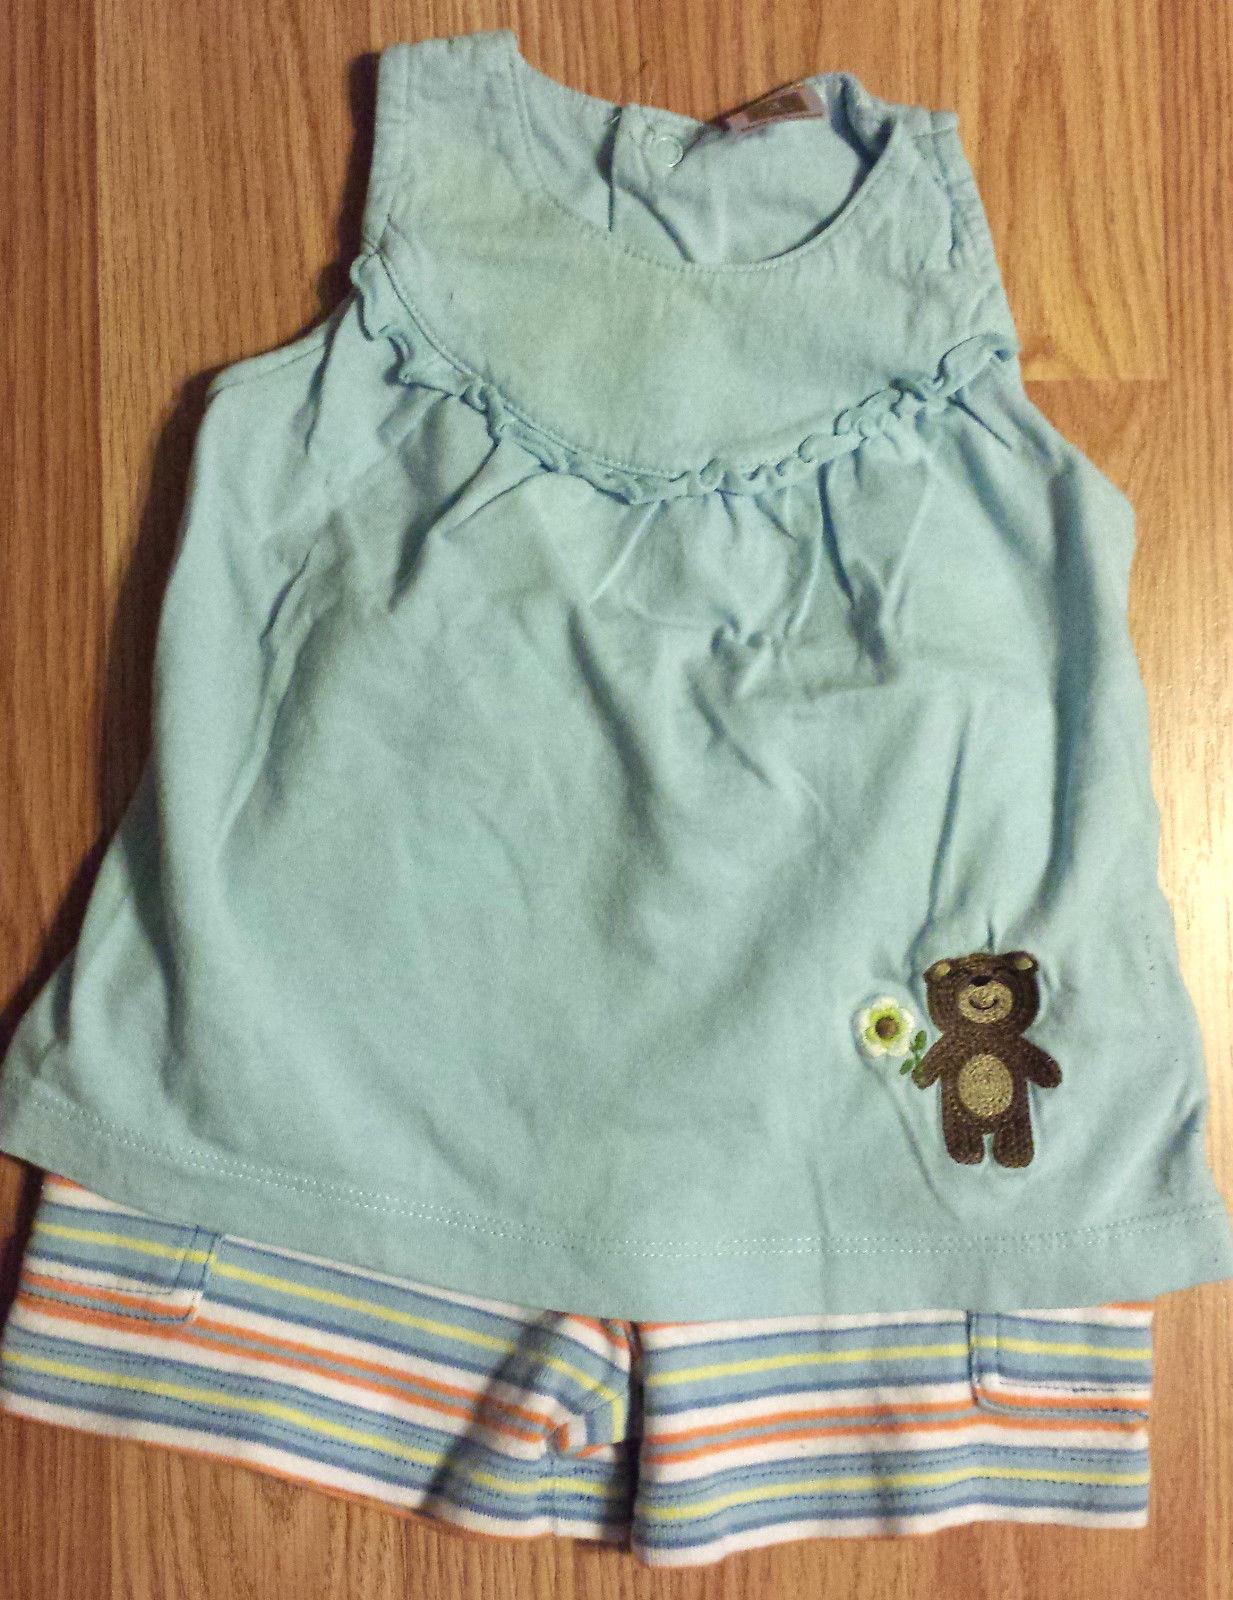 Girl's Size 0-3 M Months 3 Pc Blue Bear W/ Flower Carter's Top, TCP Shorts & Cap